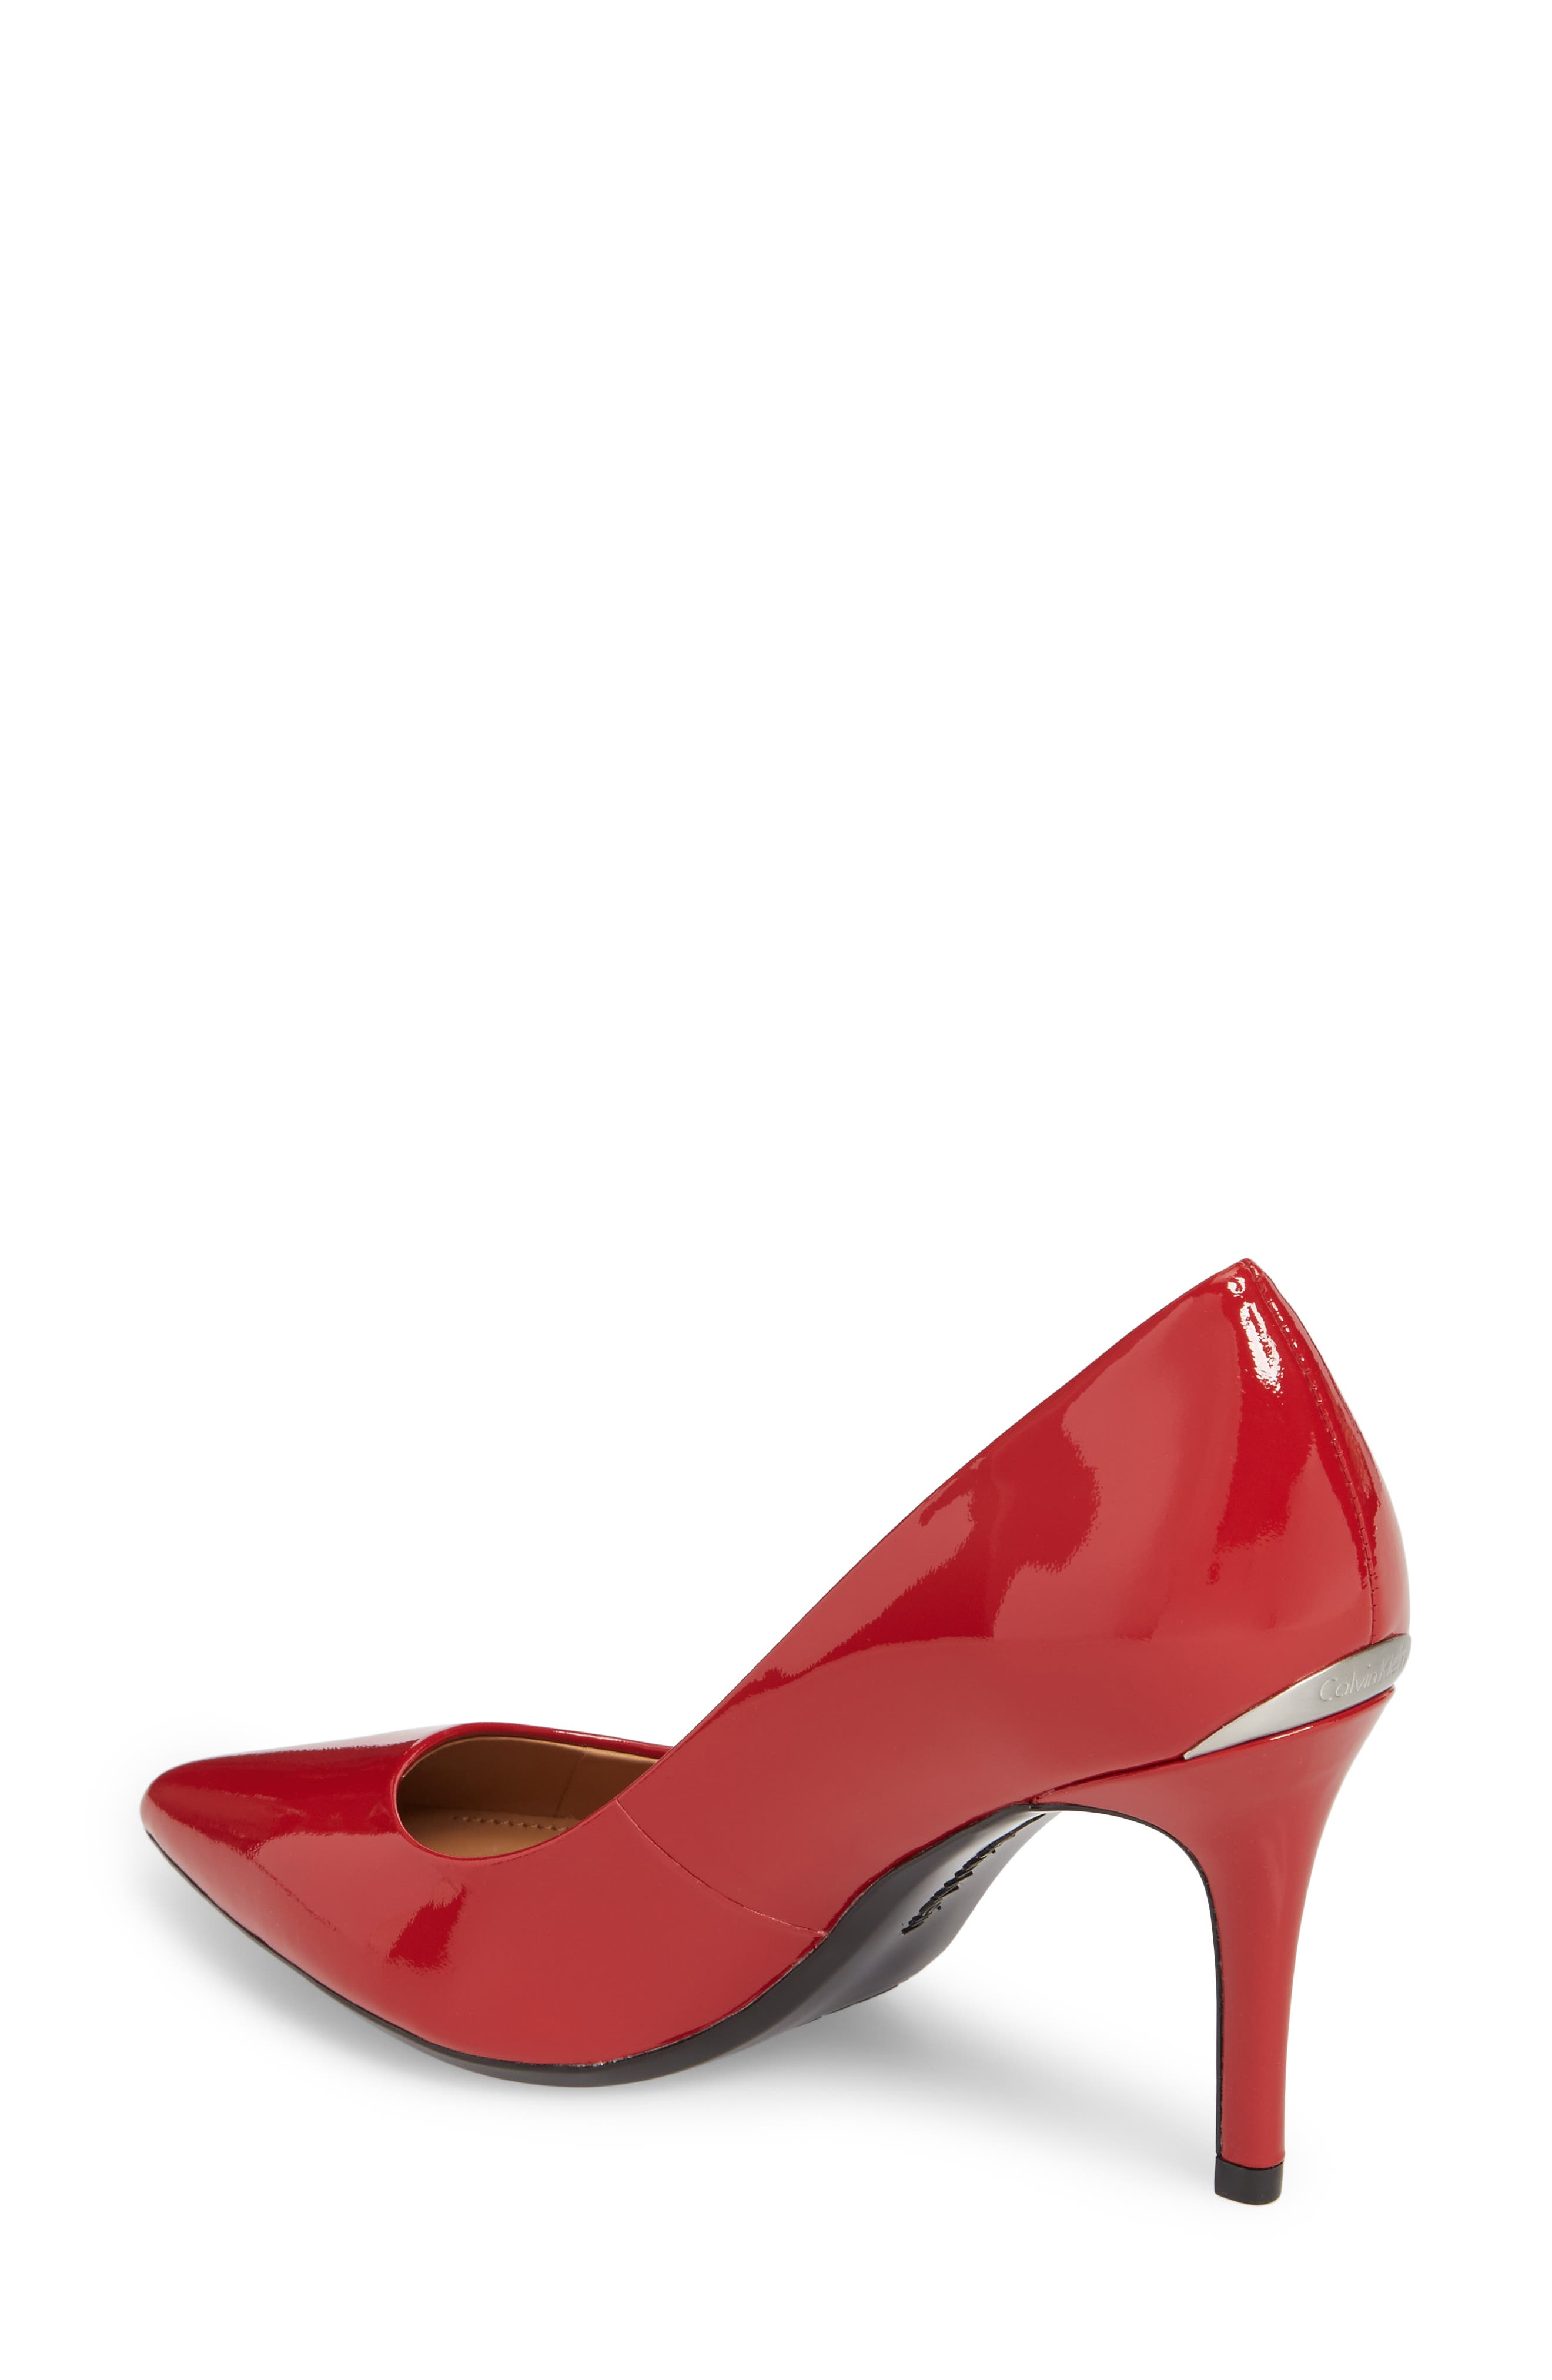 Mens Crimson Red Wedding Shoes Printed MJ014494